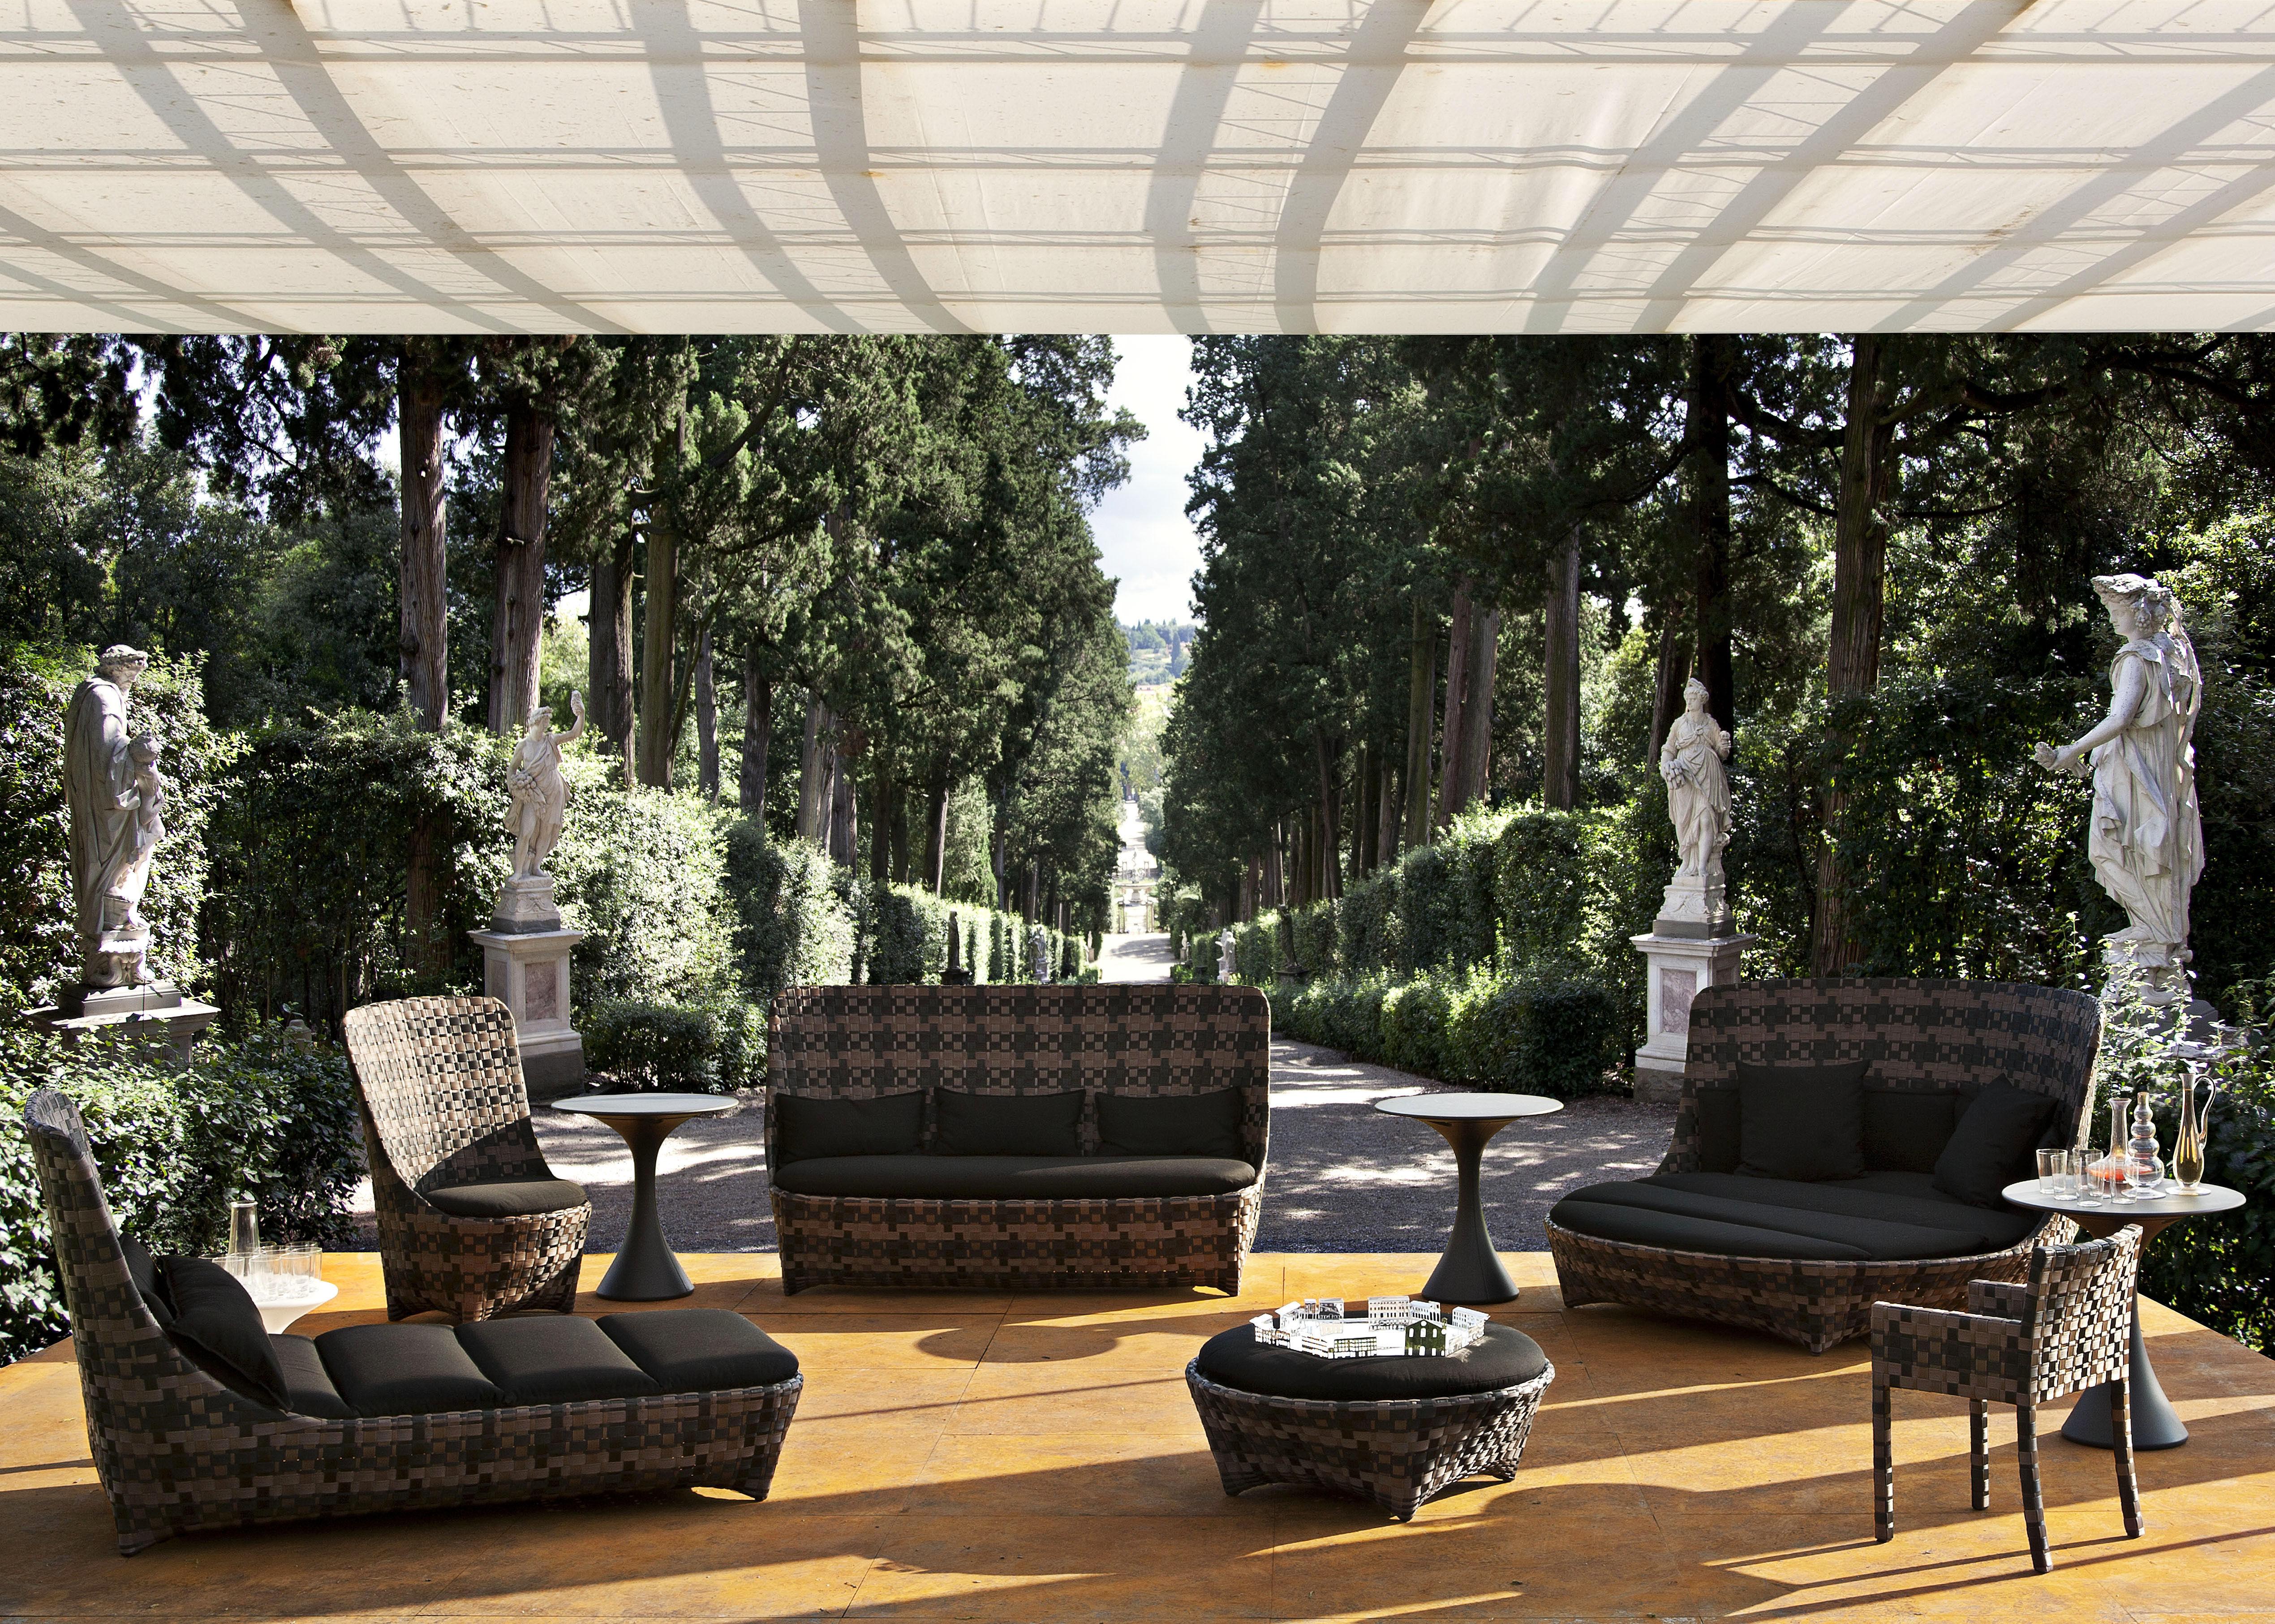 Cape west reclining chair sunbath white grey by driade for Arredo esterno design